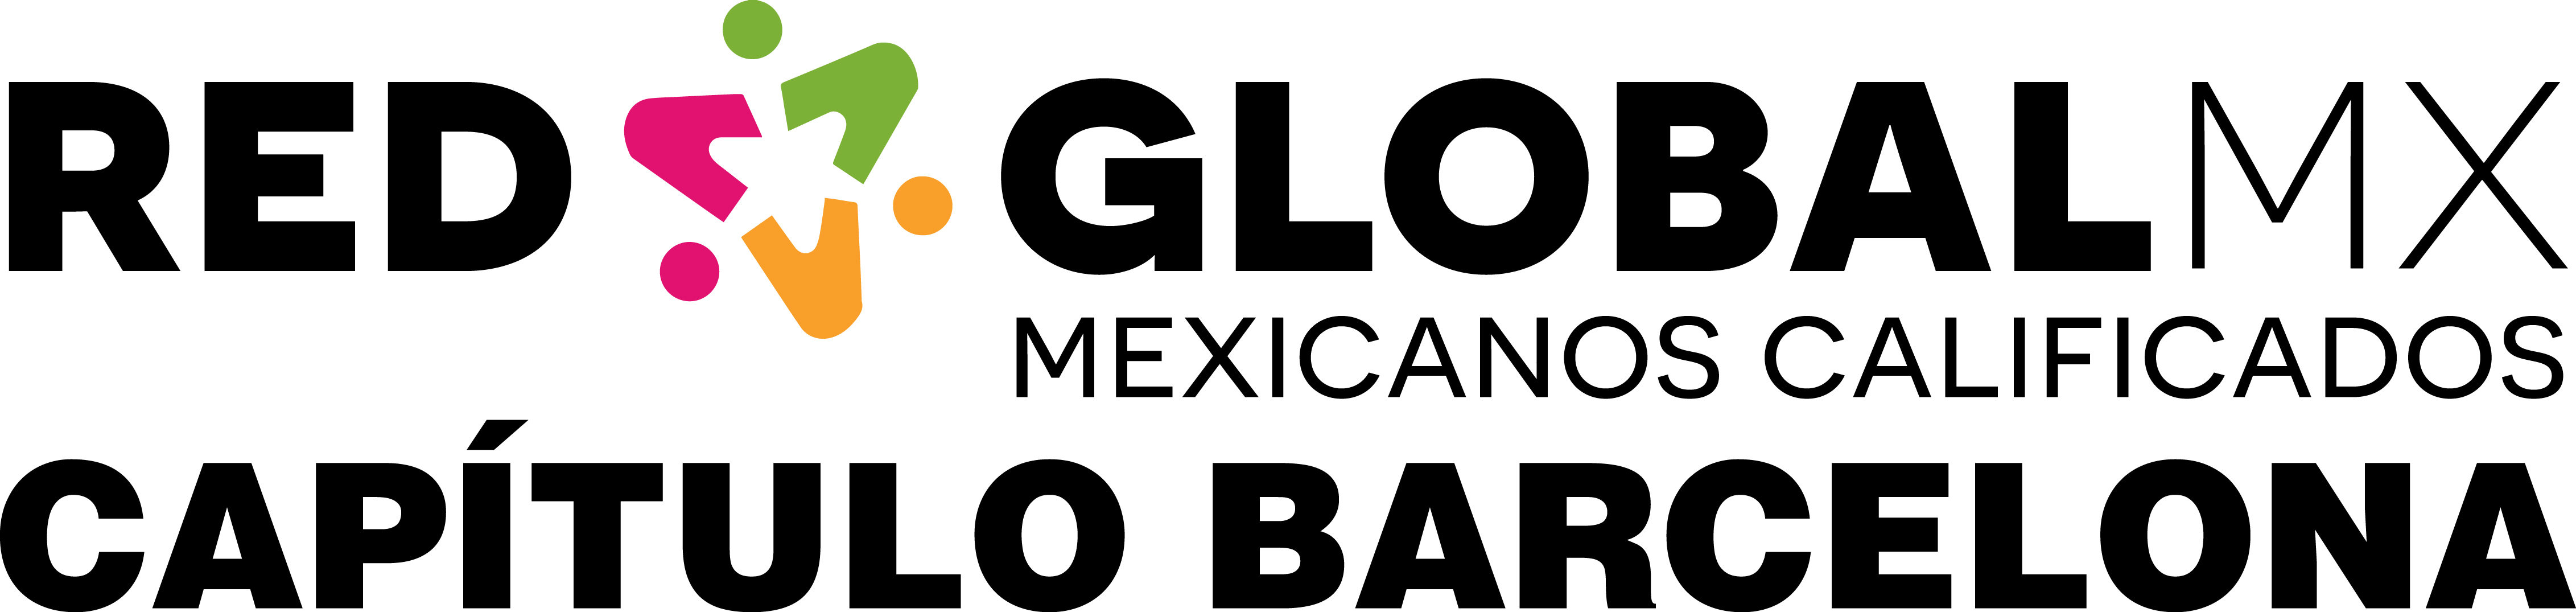 Asociación de profesionales mexicanos